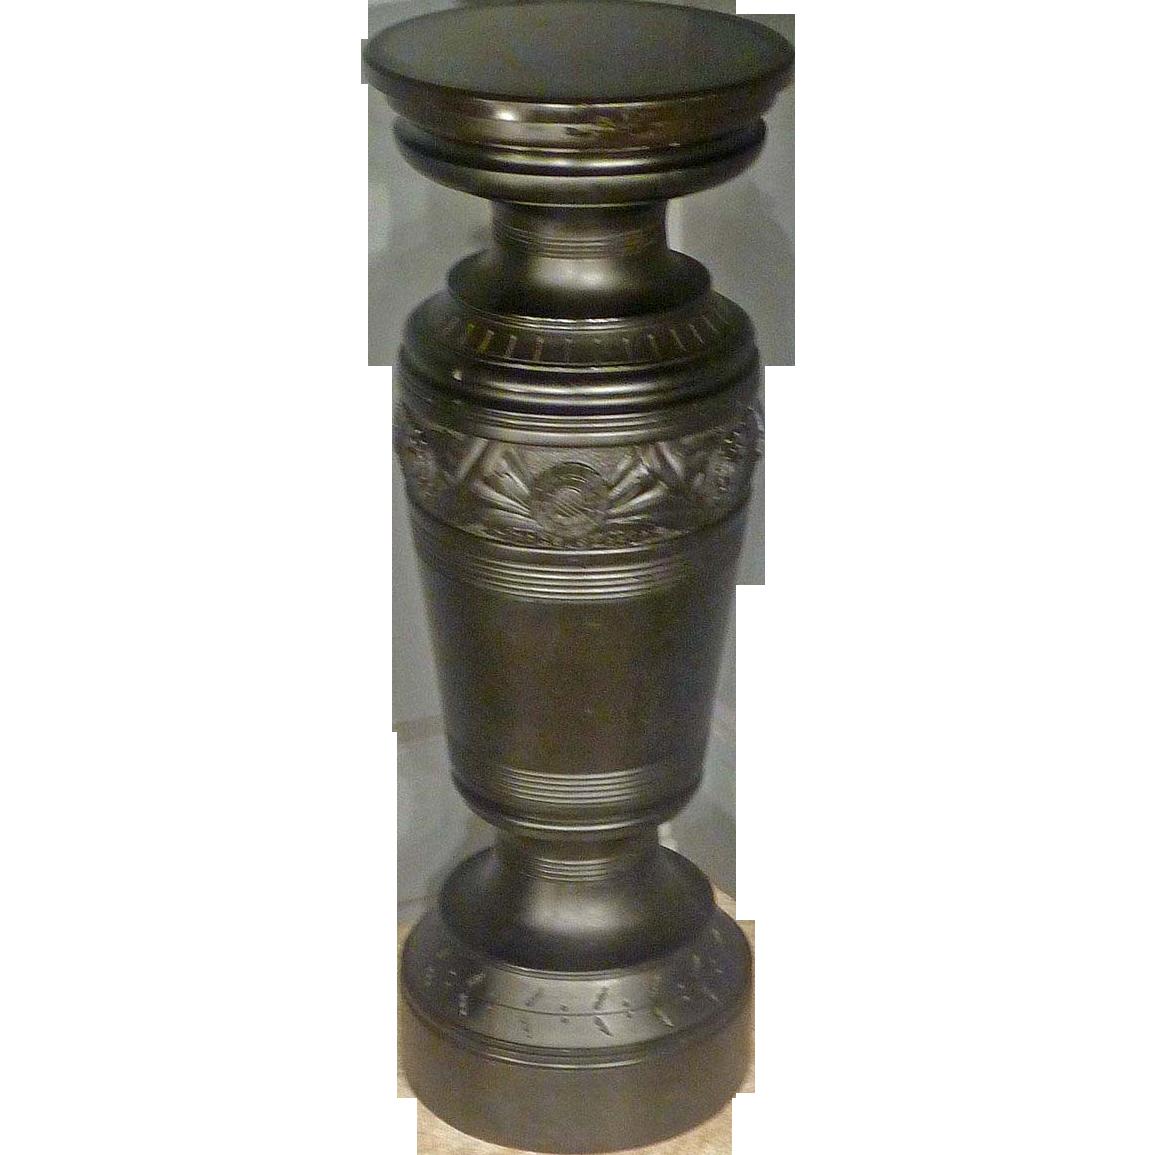 Ebonized Aesthetic Pedestal